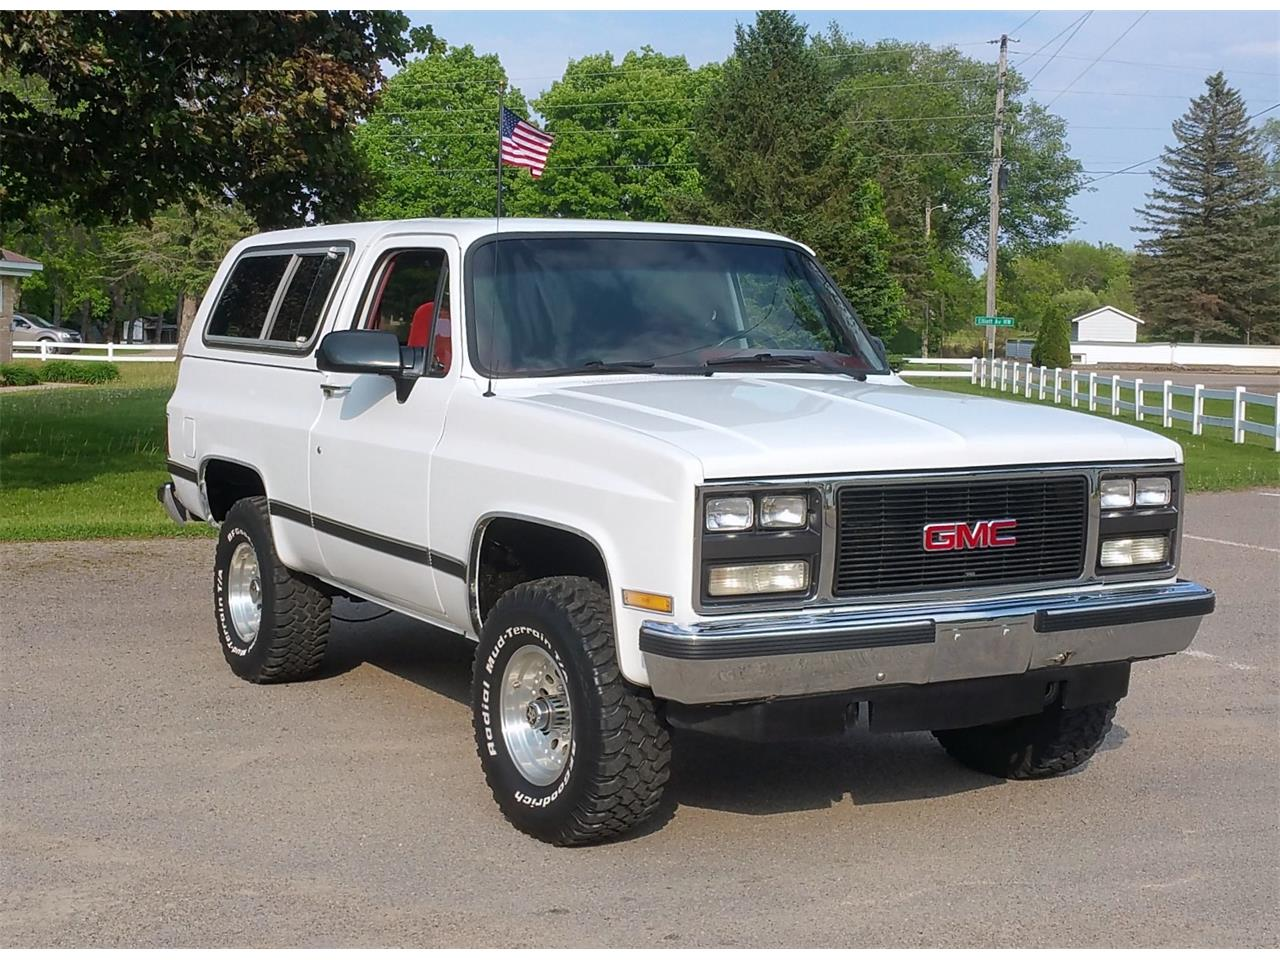 1990 Gmc Jimmy For Sale Classiccars Com Cc 984871